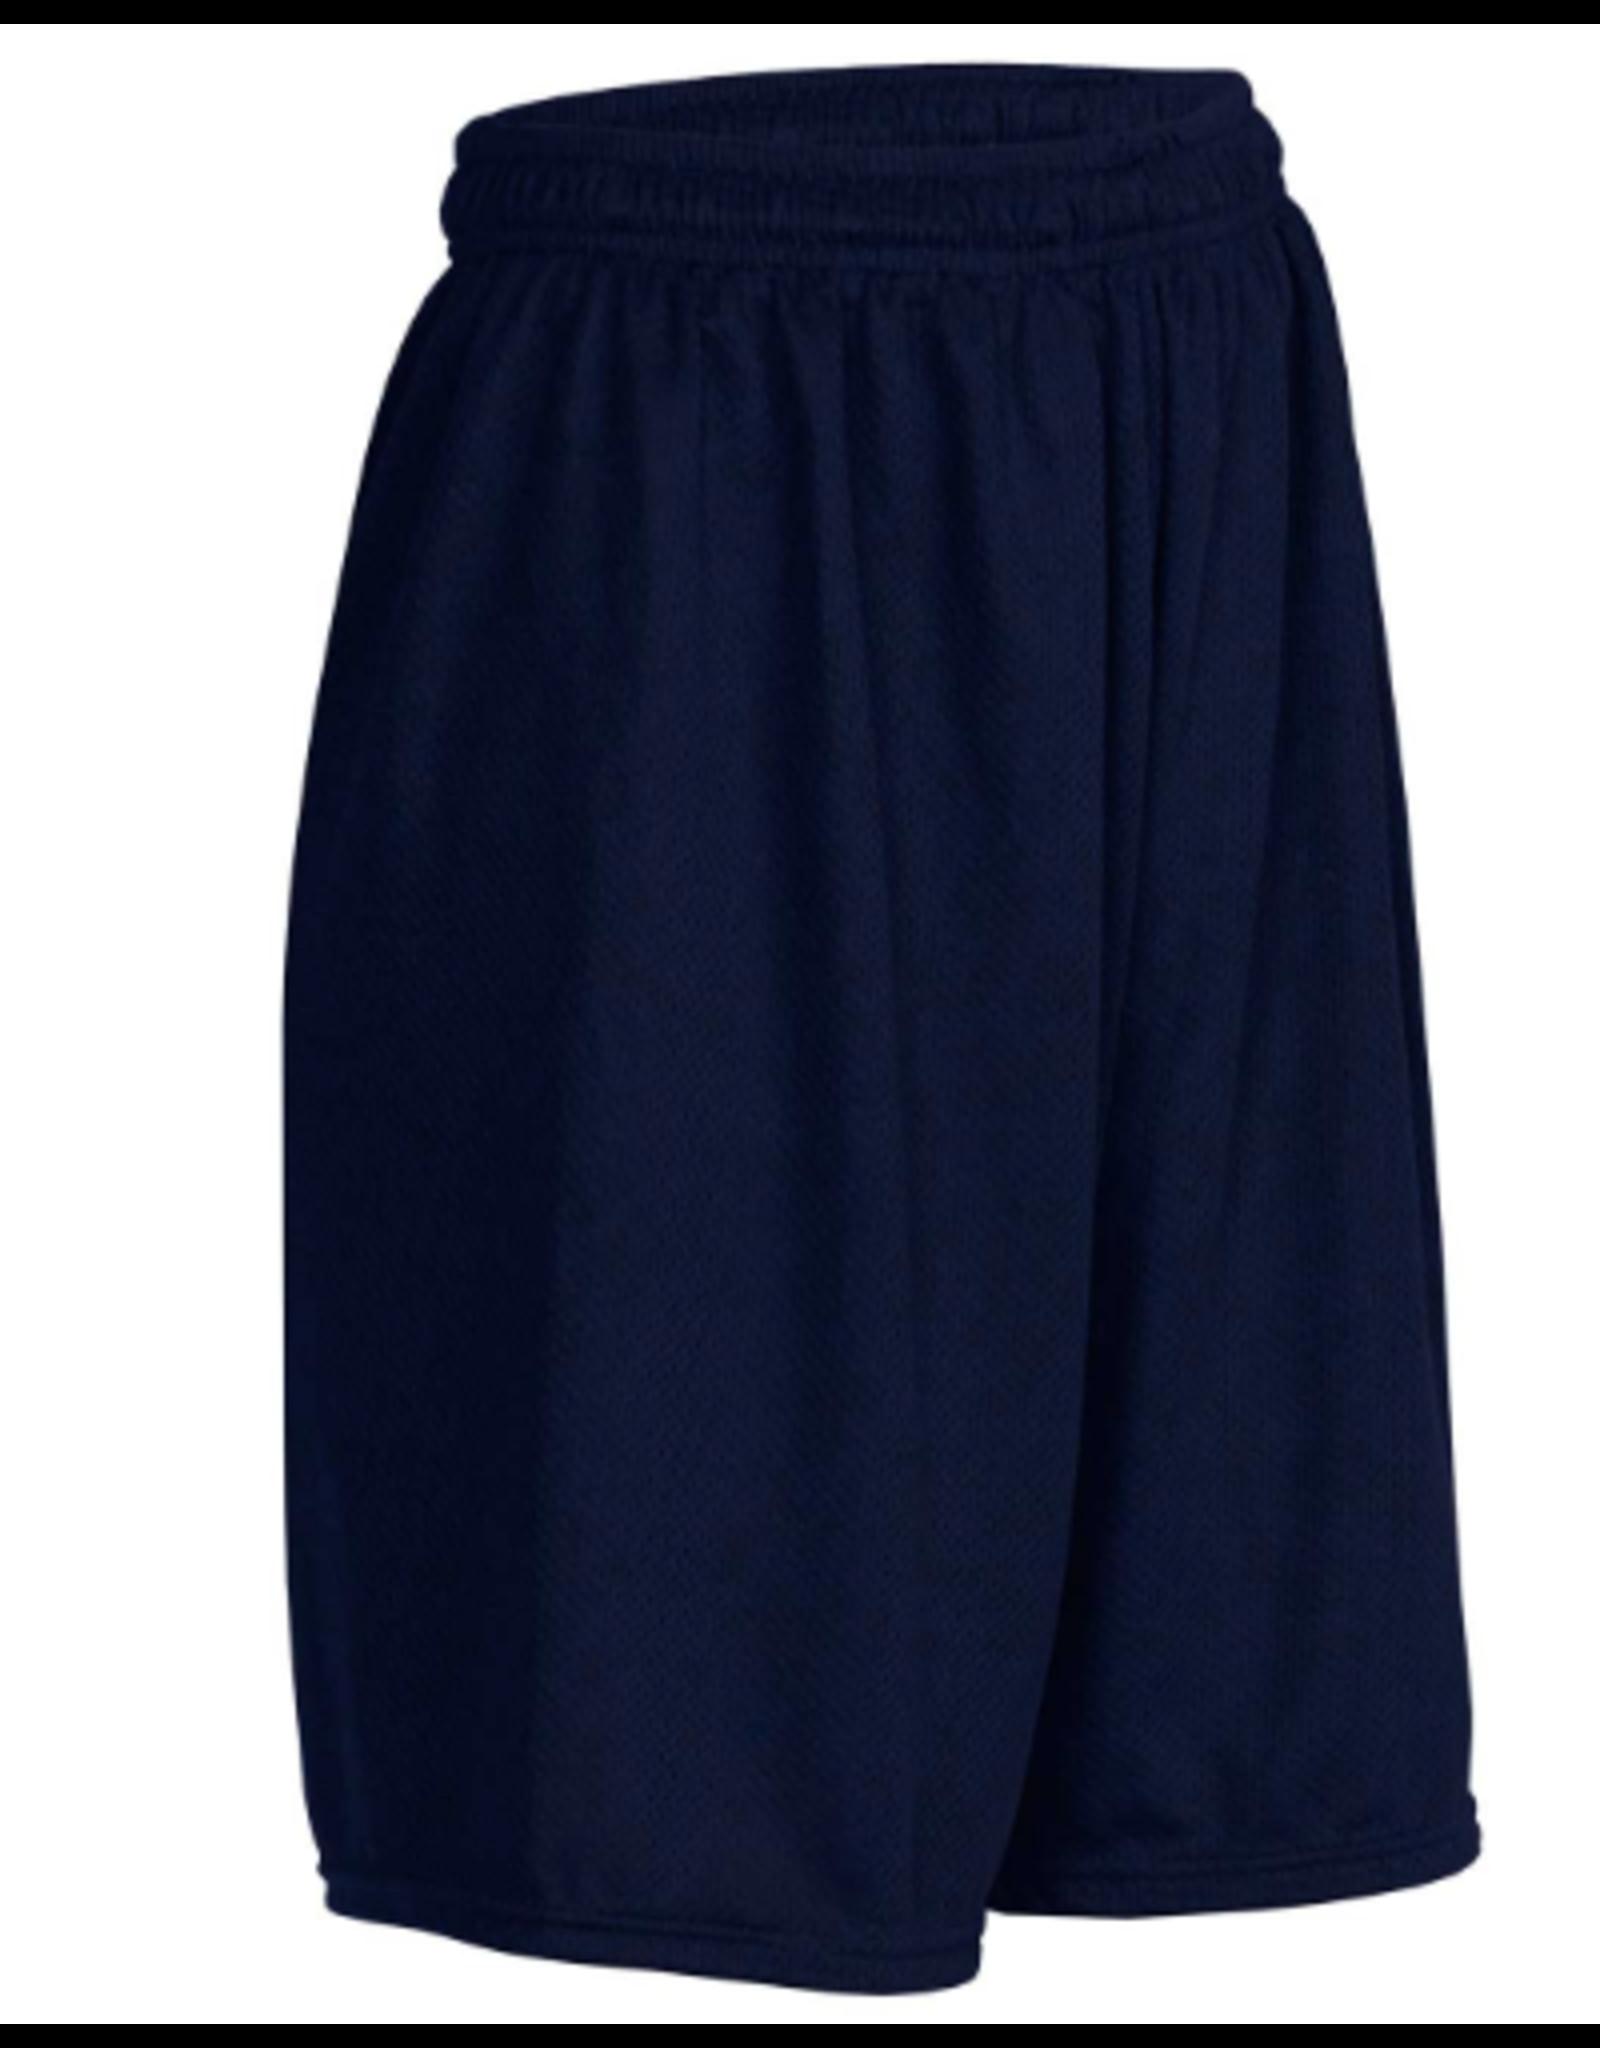 UNIFORM Gym Shorts, Youth & Adult